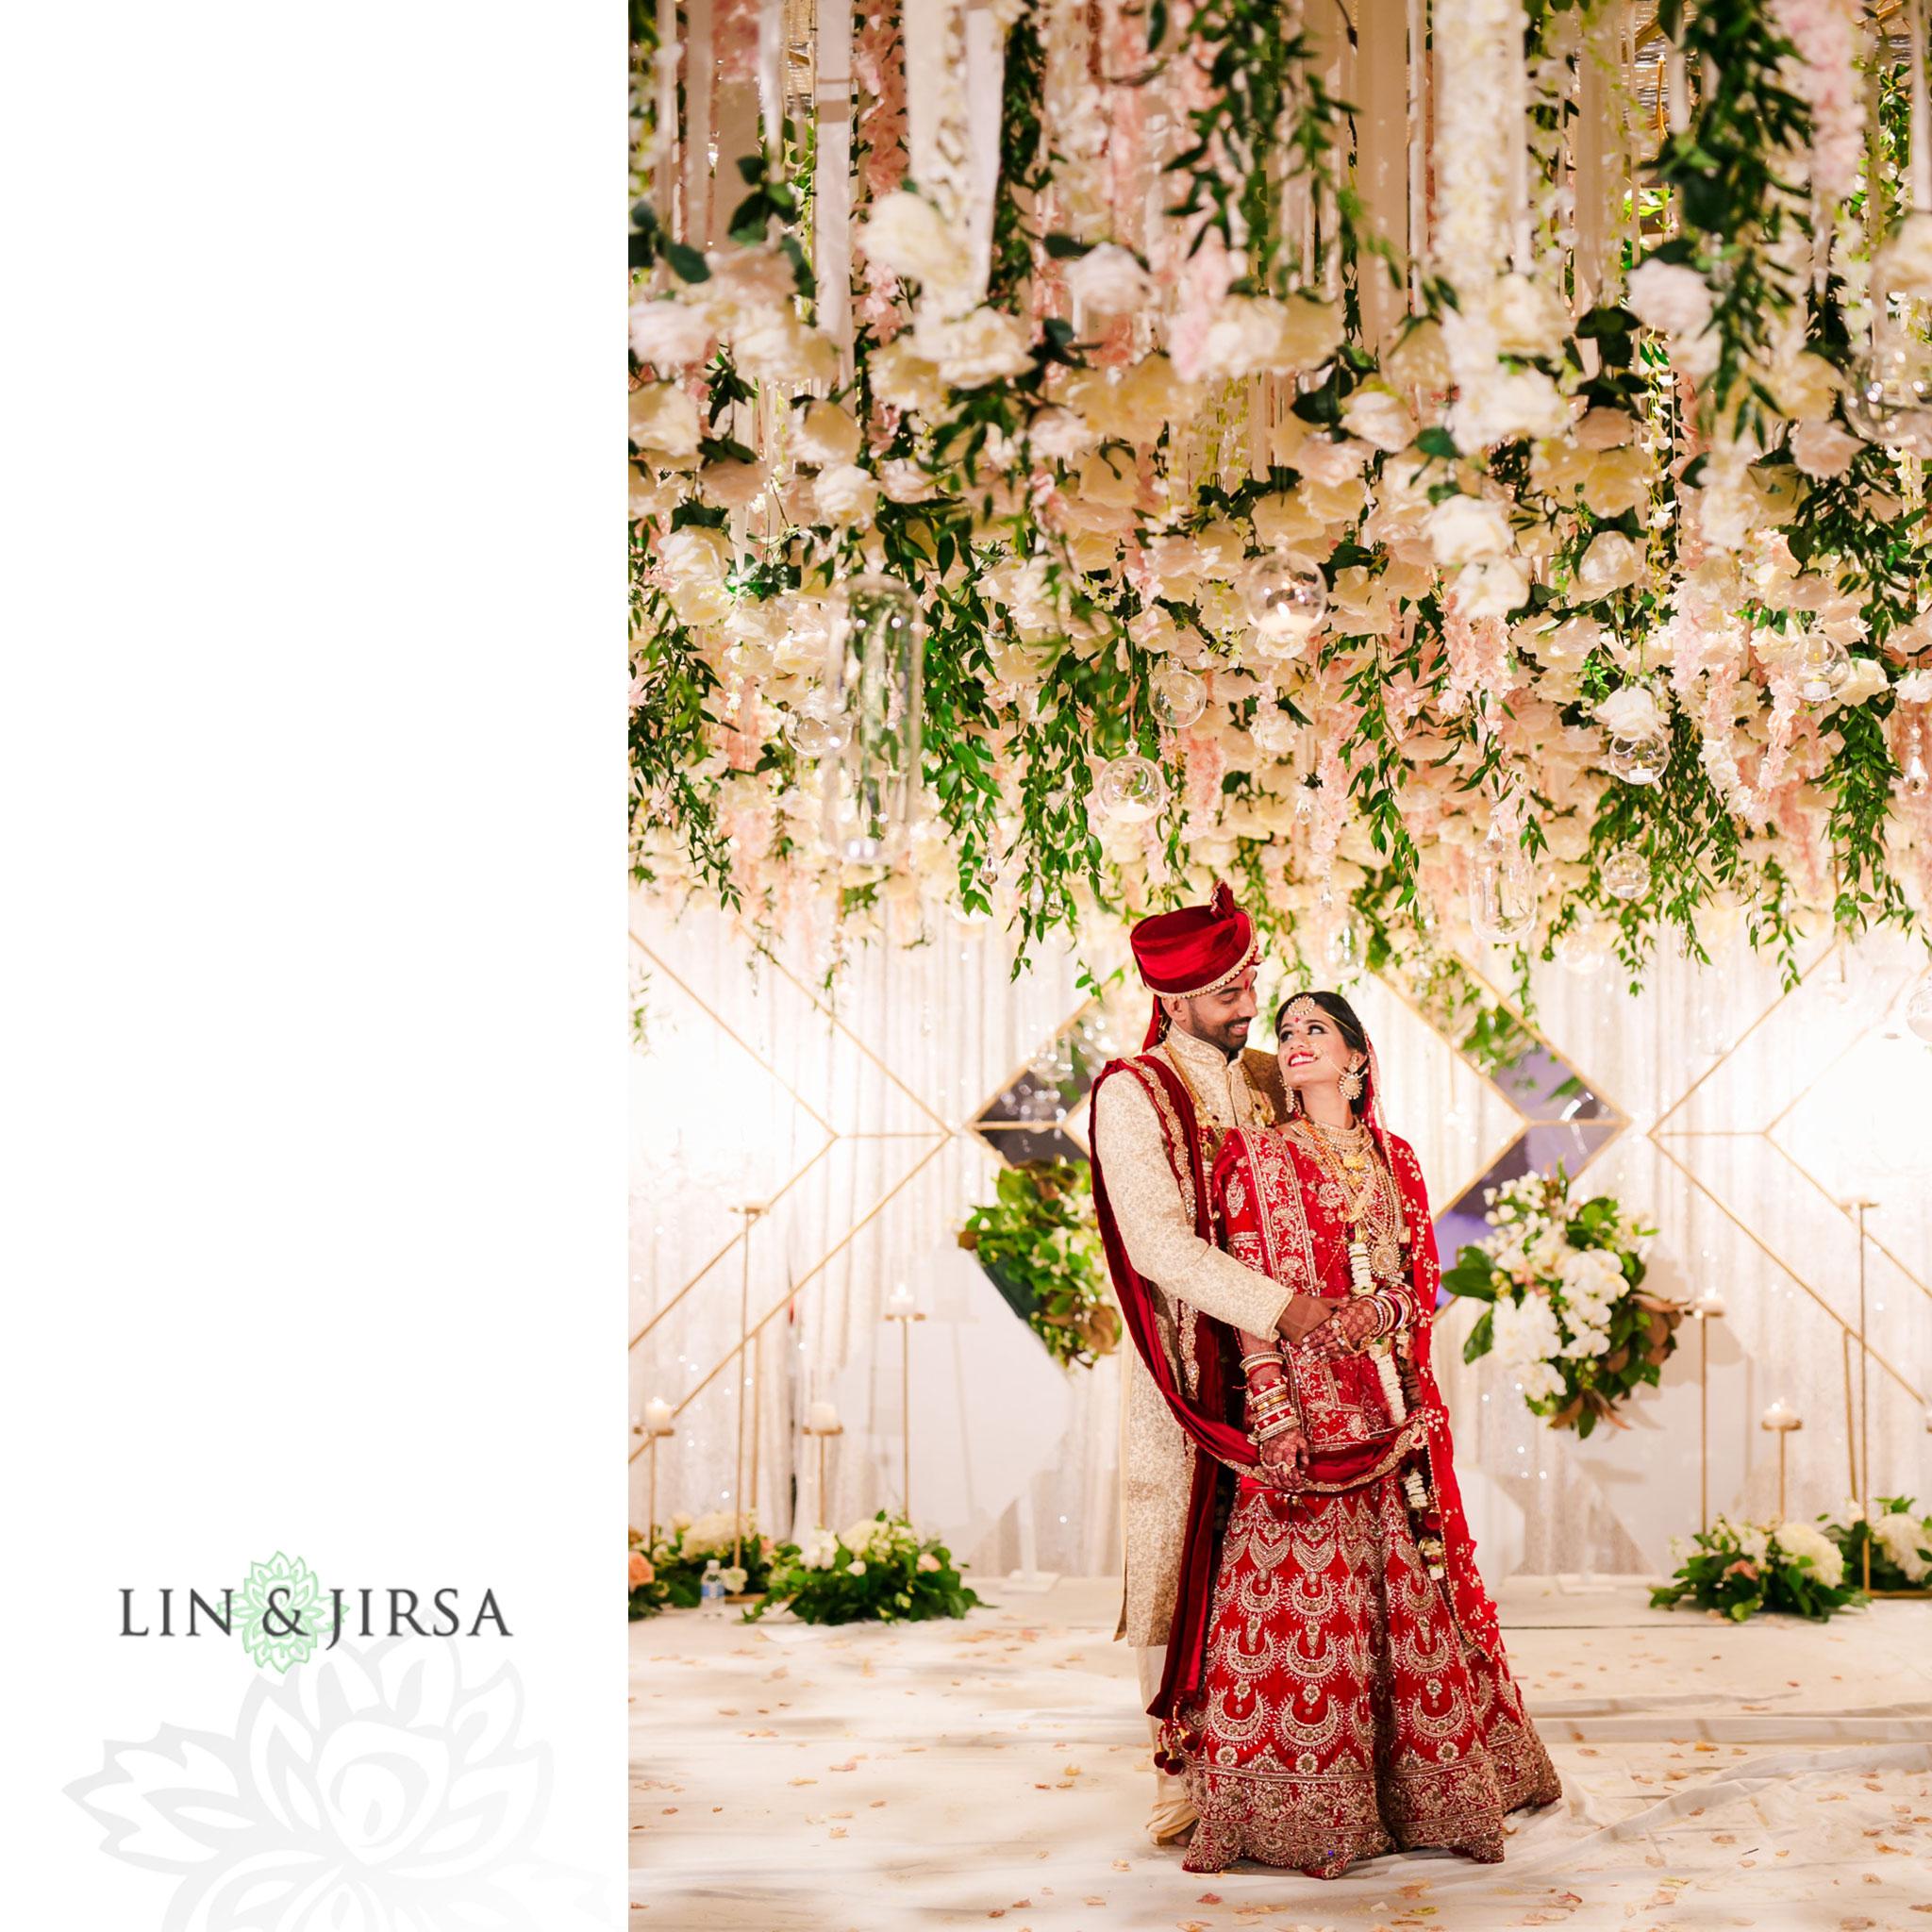 020 san jose marriott indian wedding photography